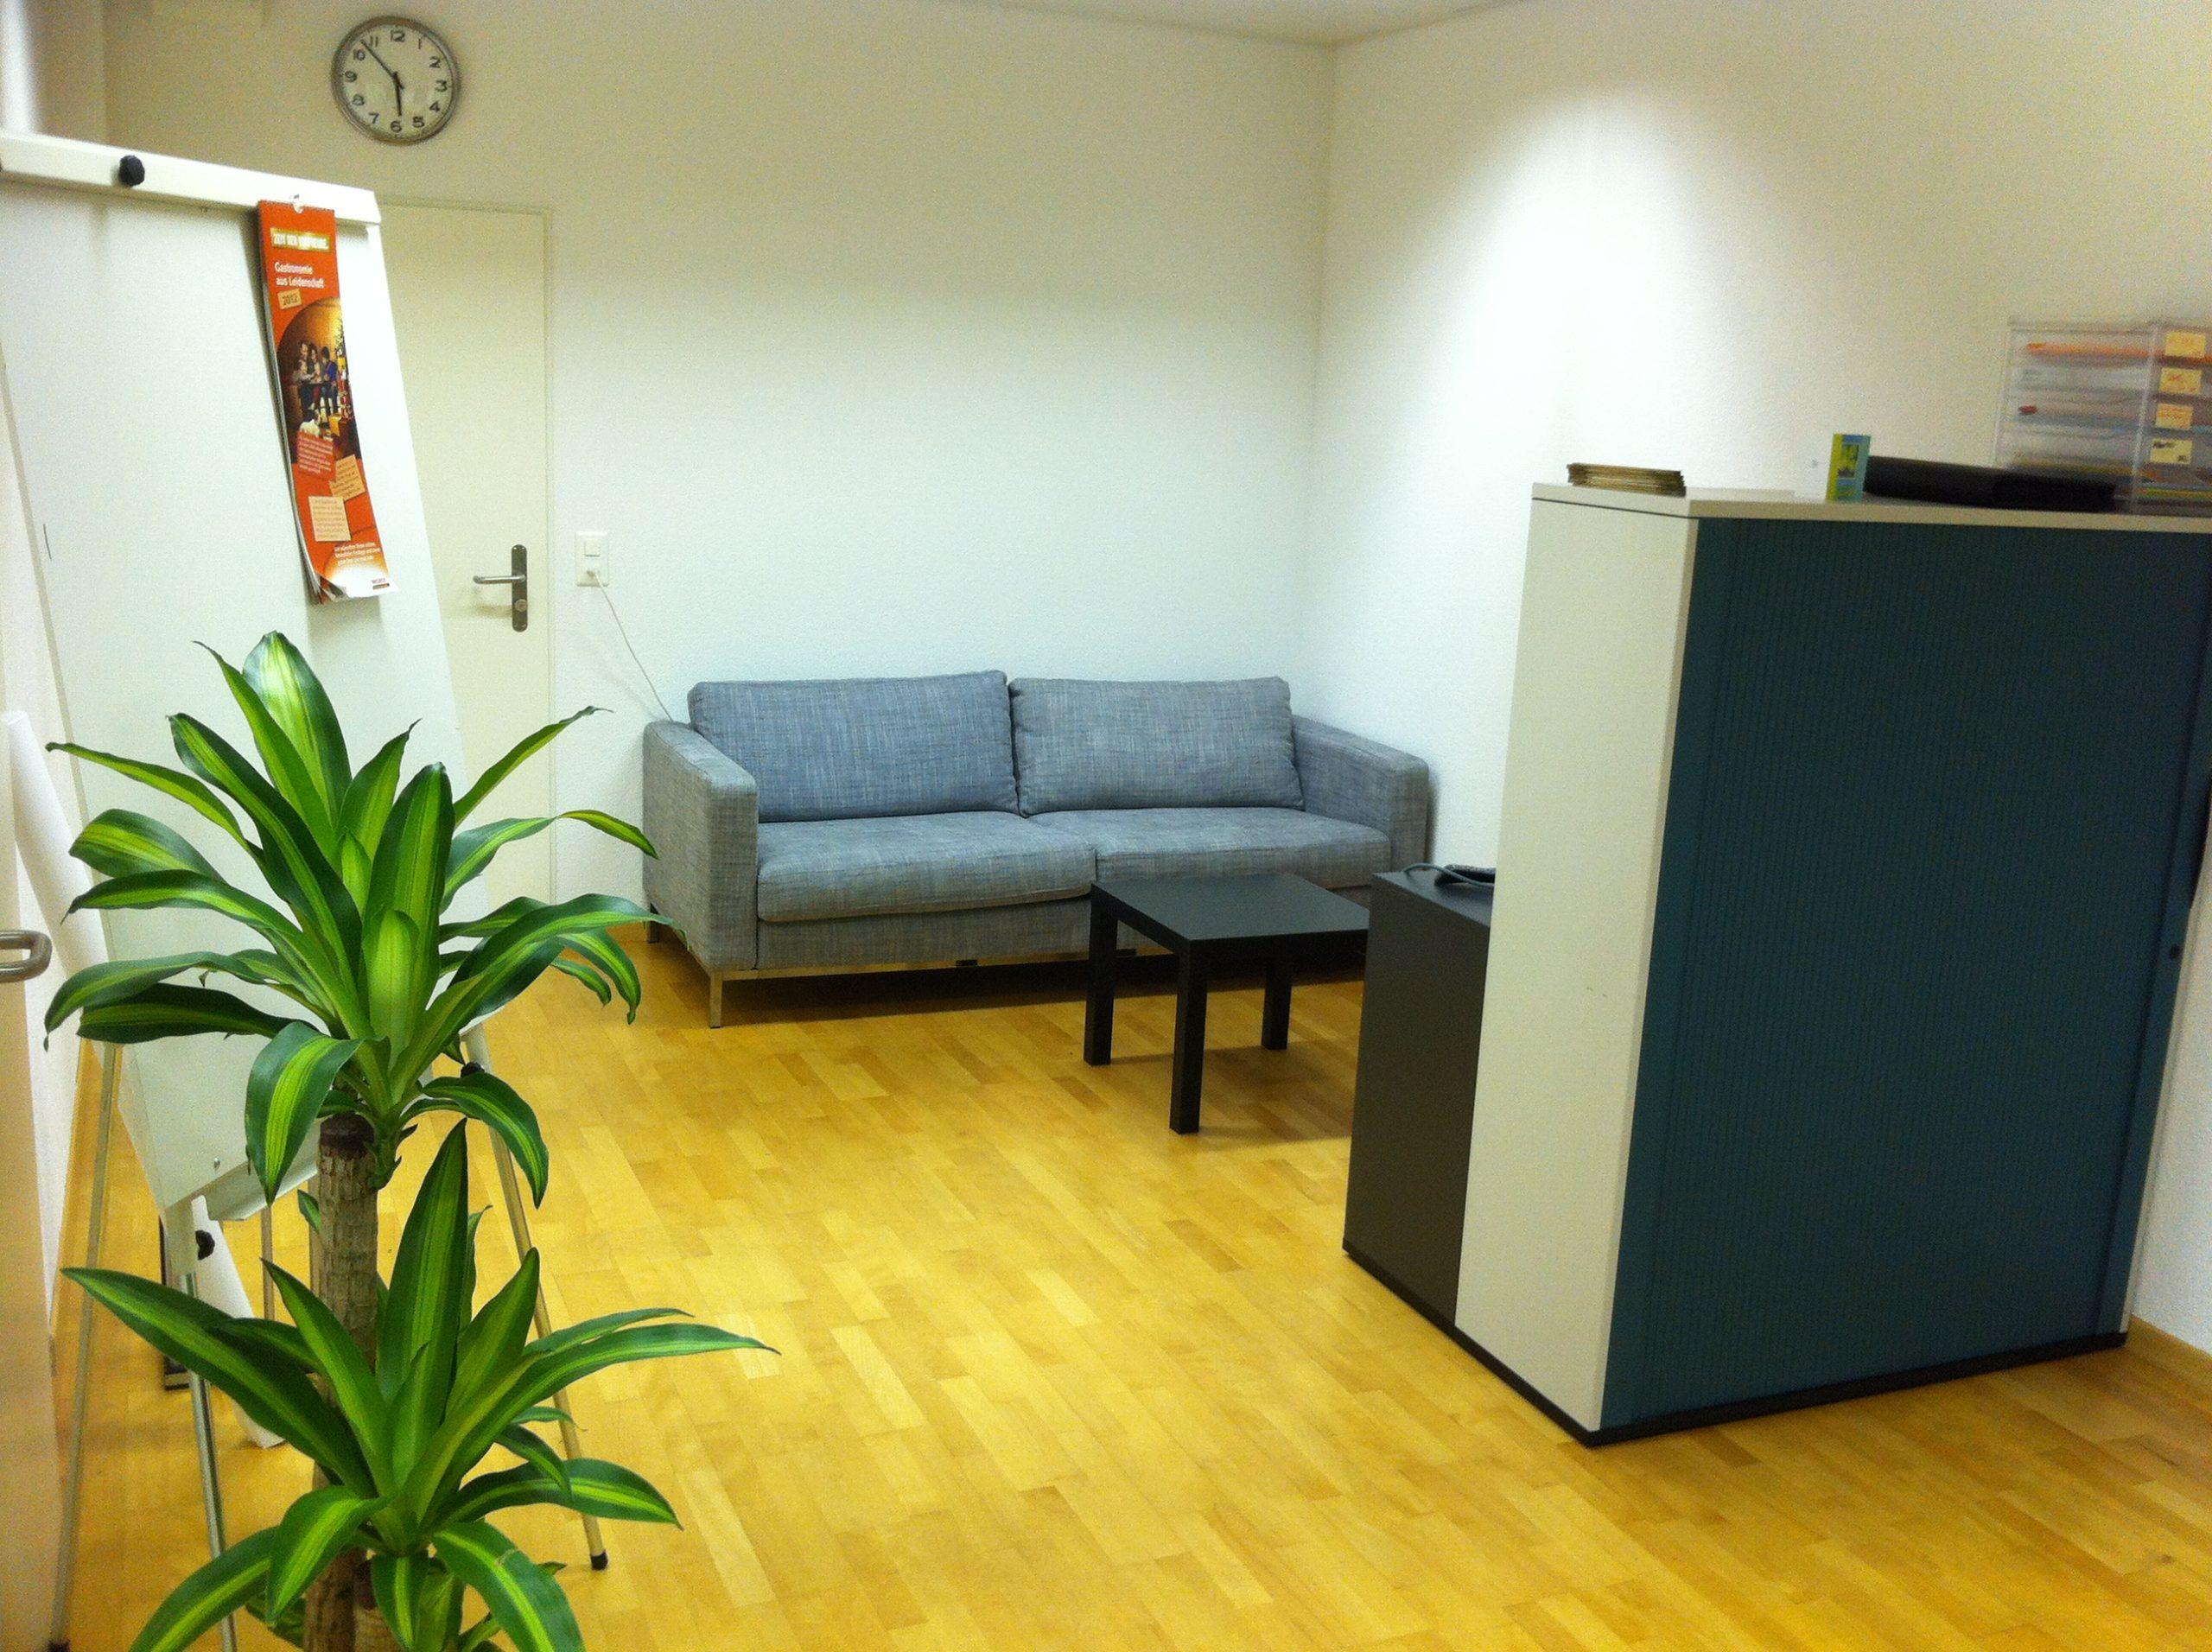 Erstes Büro in Wettingen